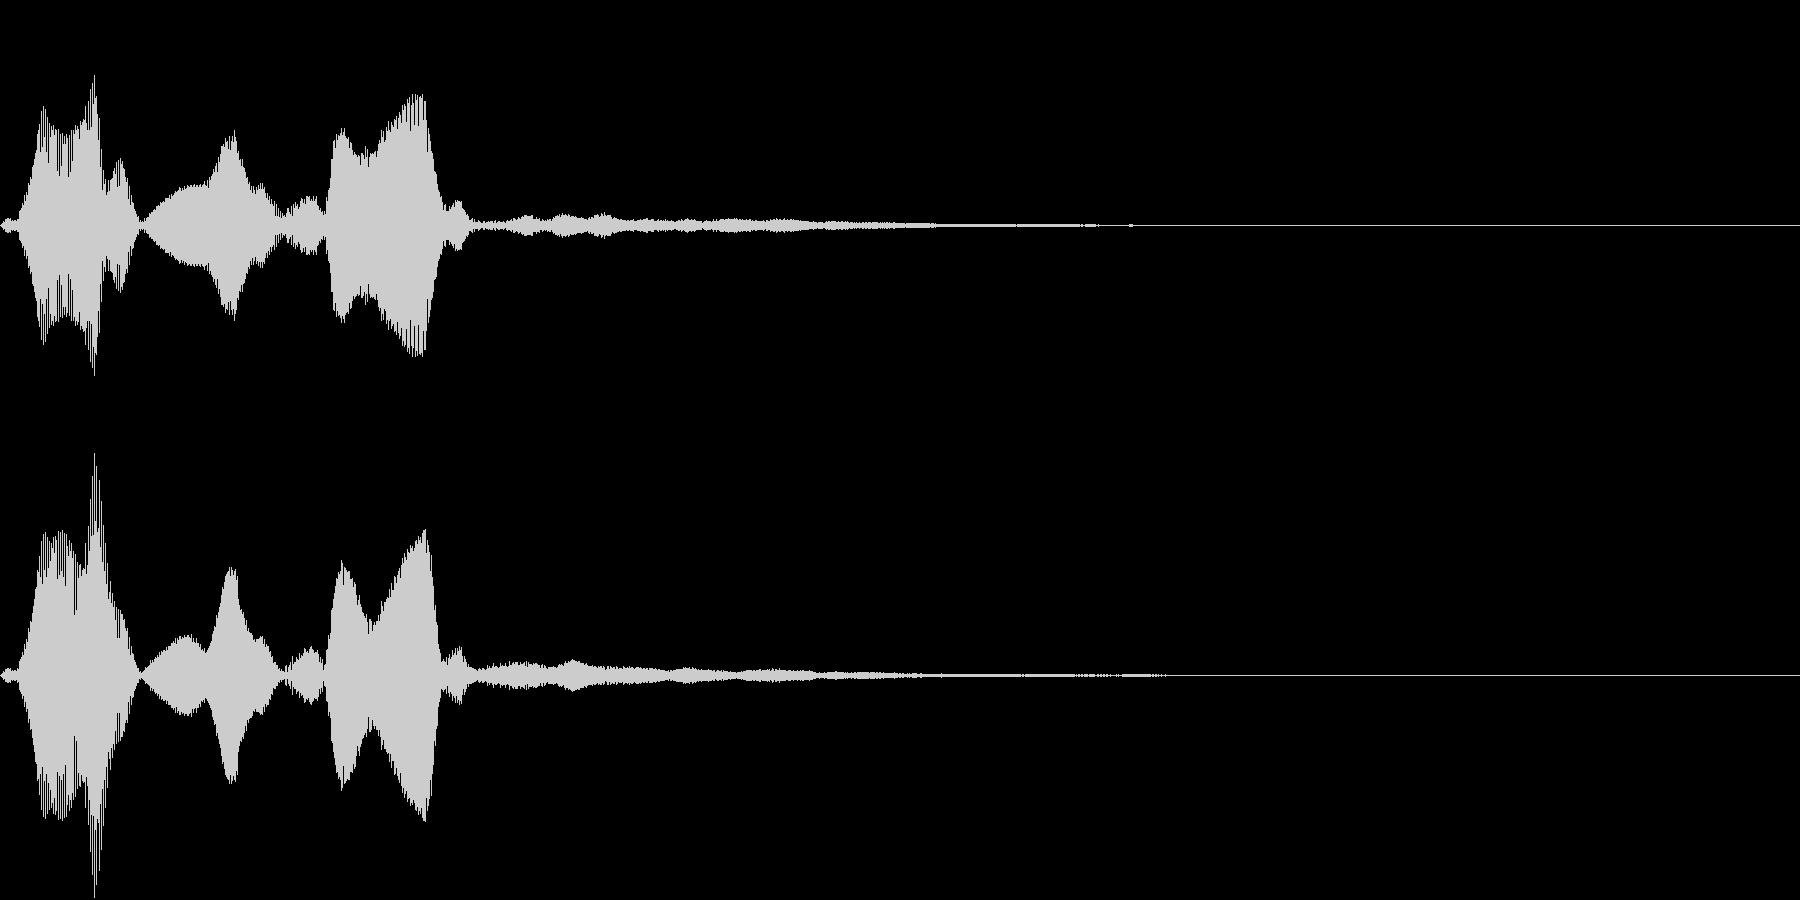 Command 認証・承認 電子音の未再生の波形